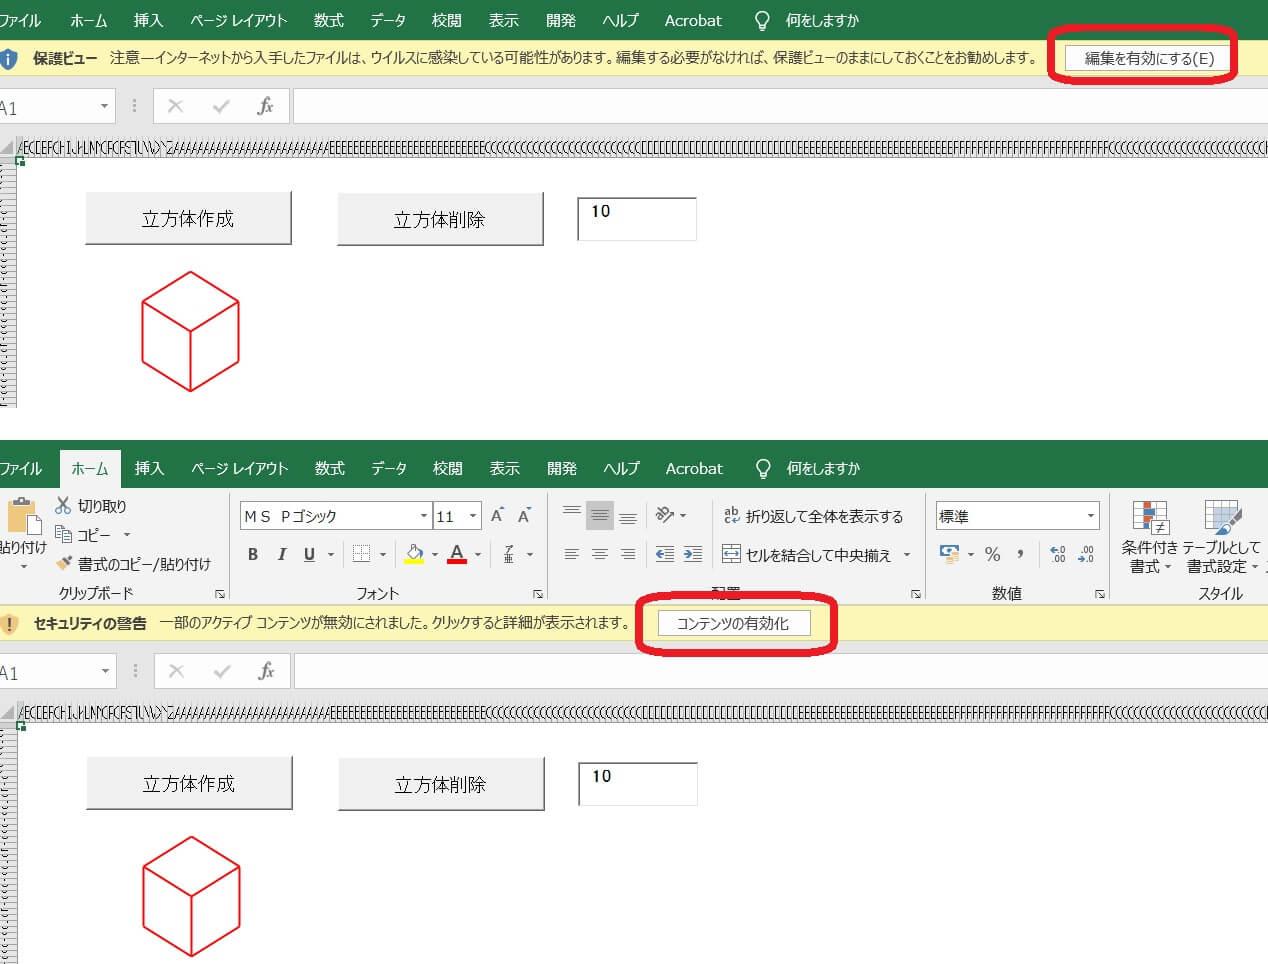 Excelファイルを開いた際の画面